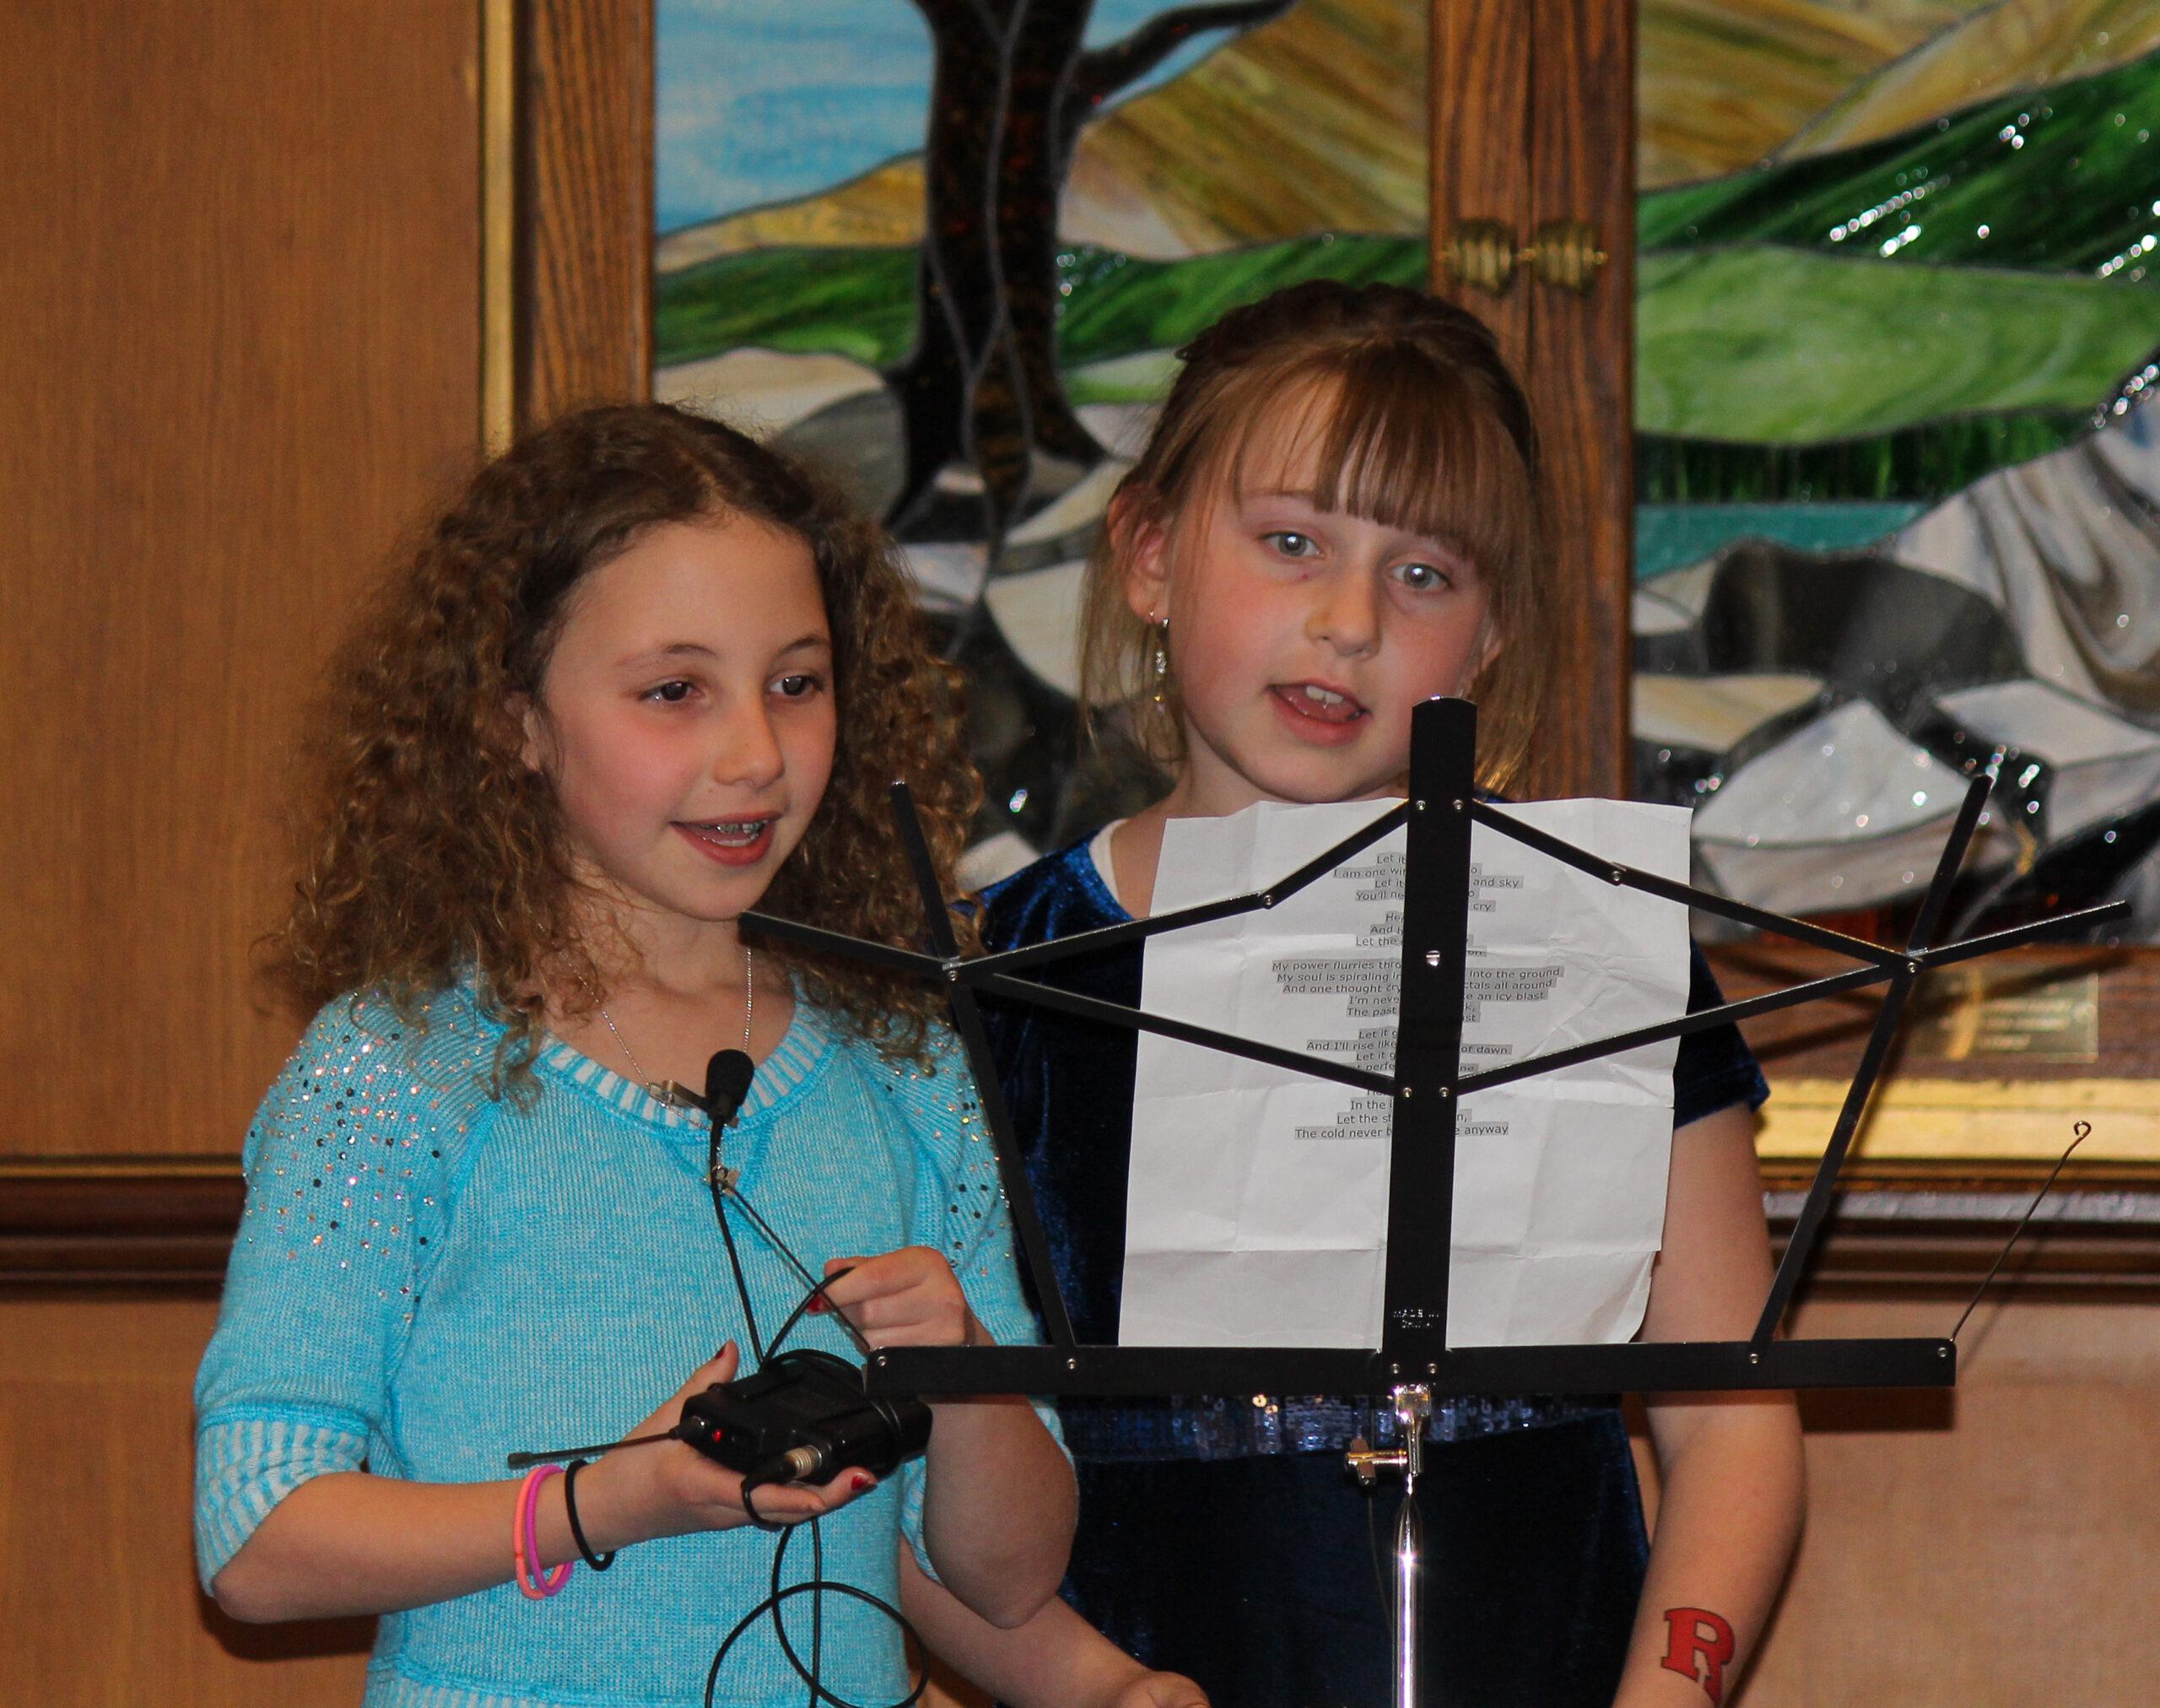 Molly and Ashley